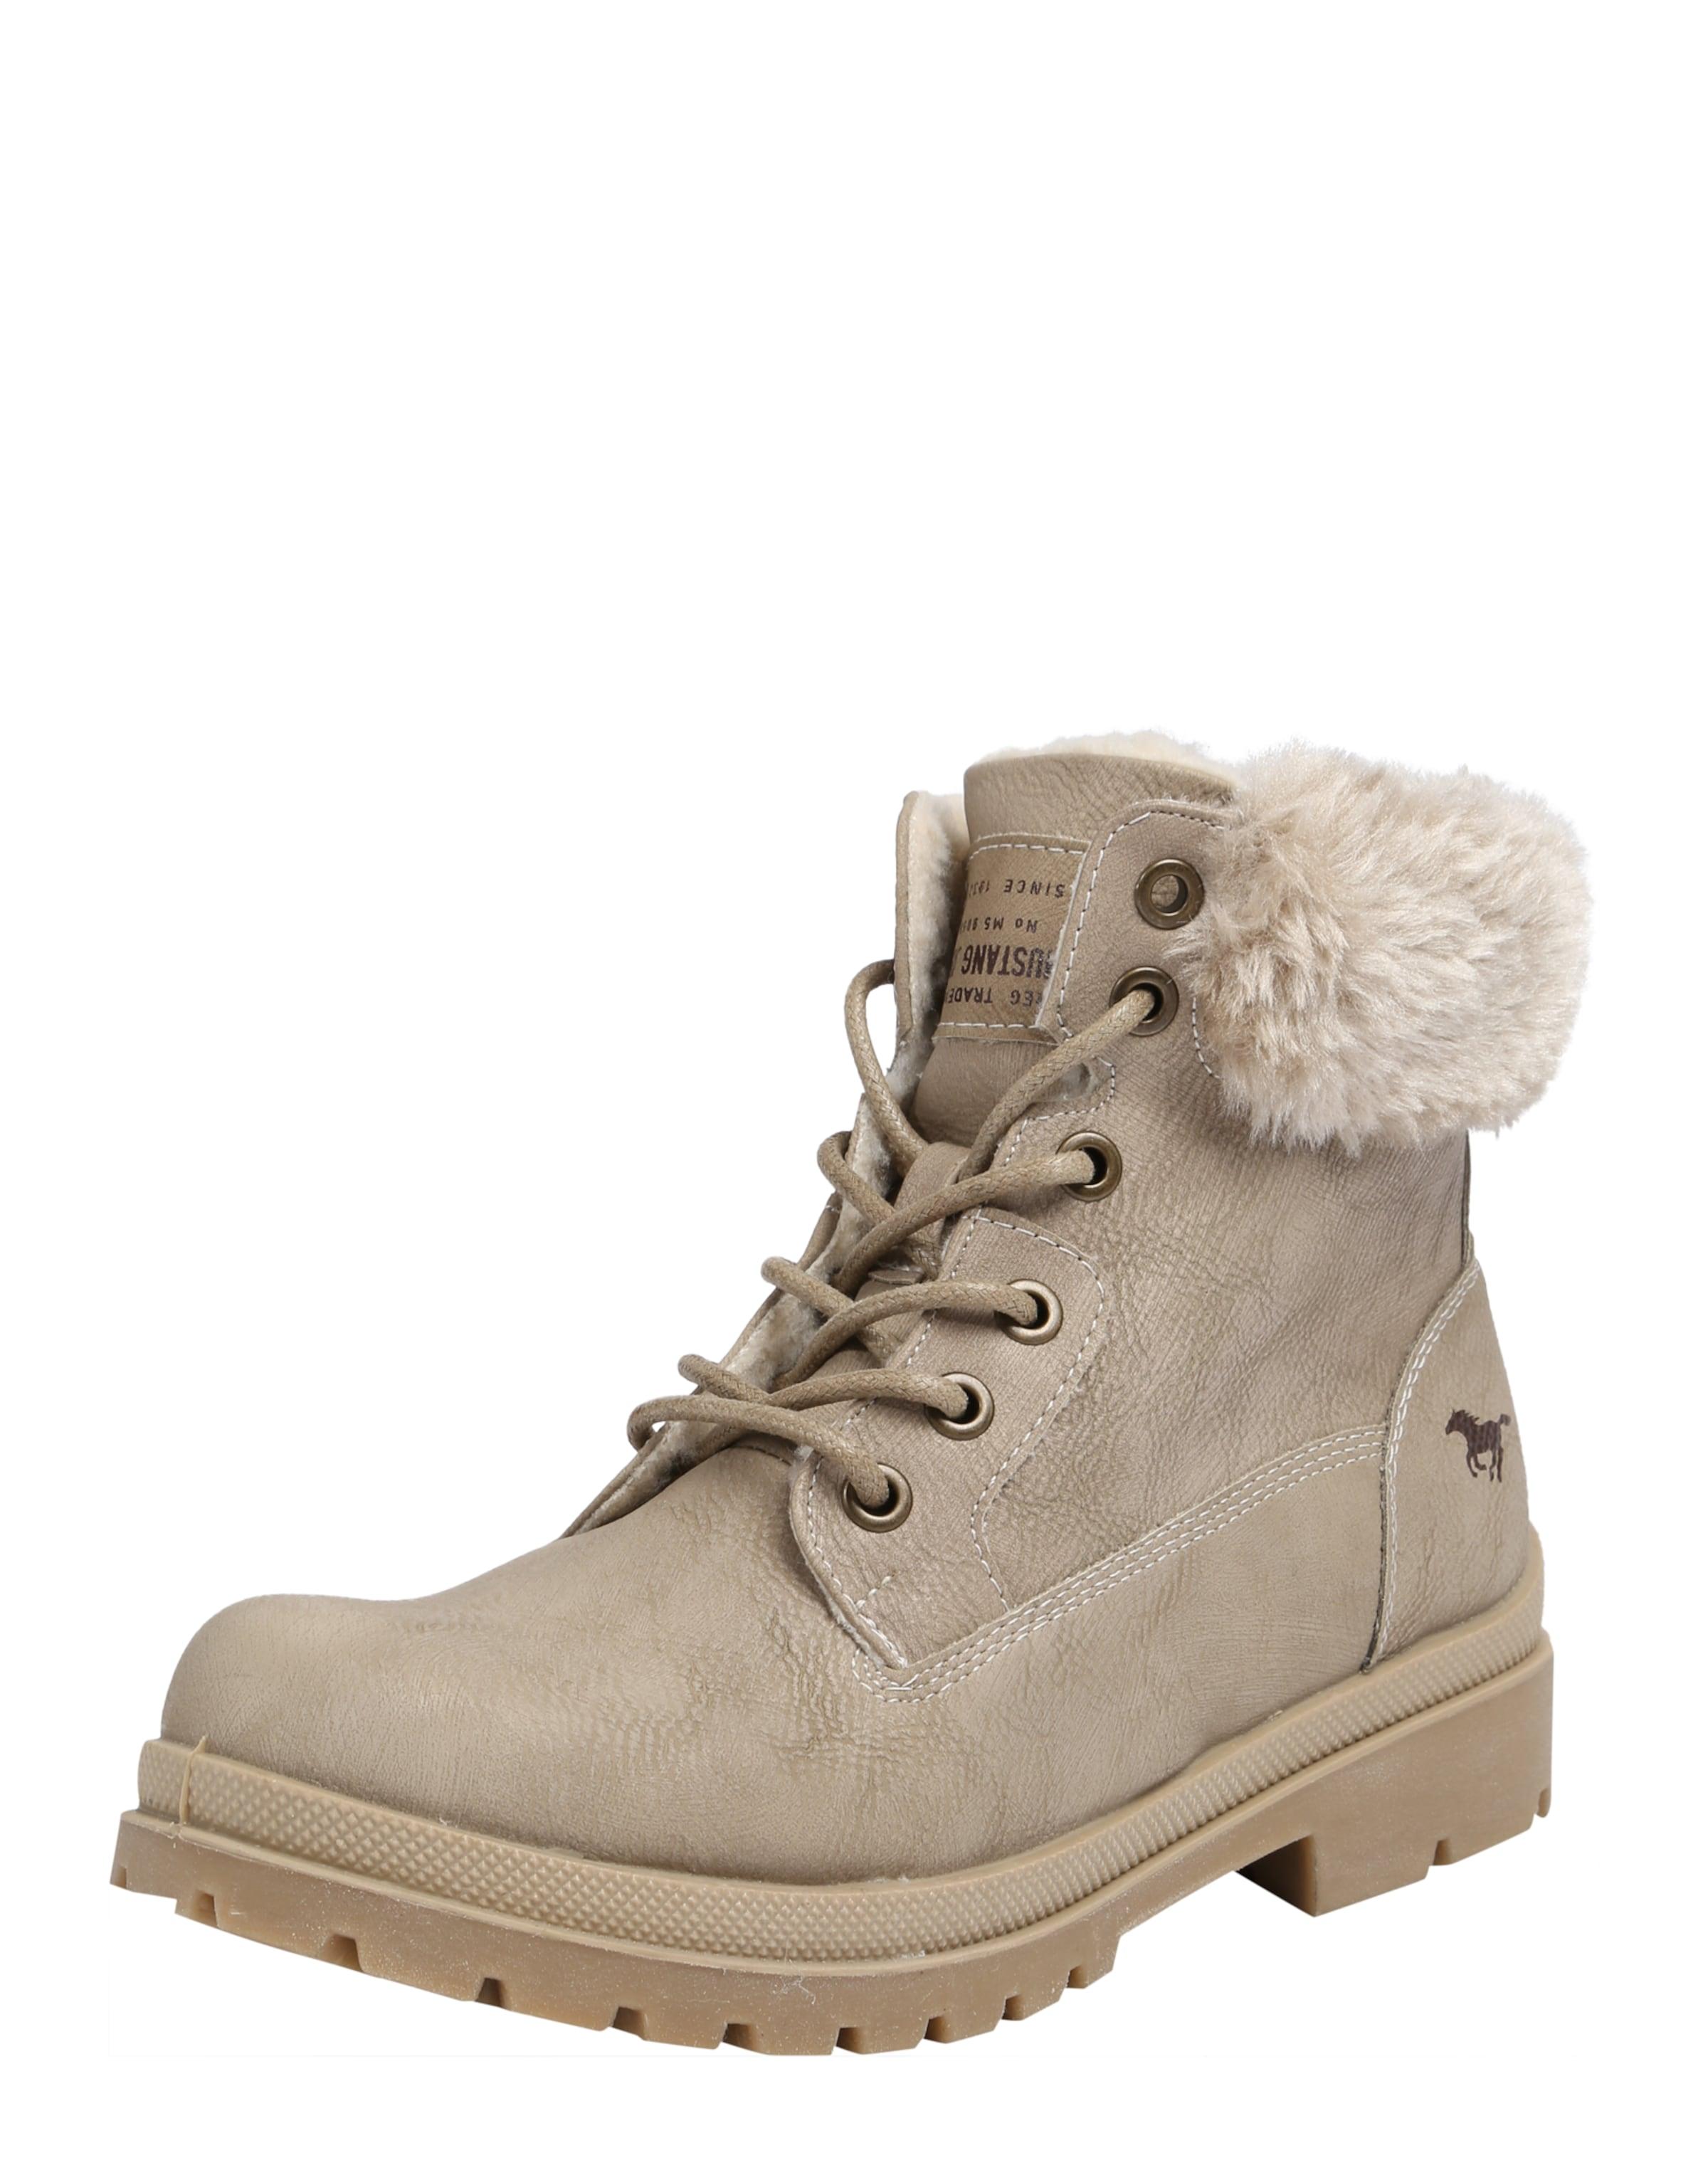 MUSTANG Schnürstiefel mit Pelzimitat Verschleißfeste billige Schuhe